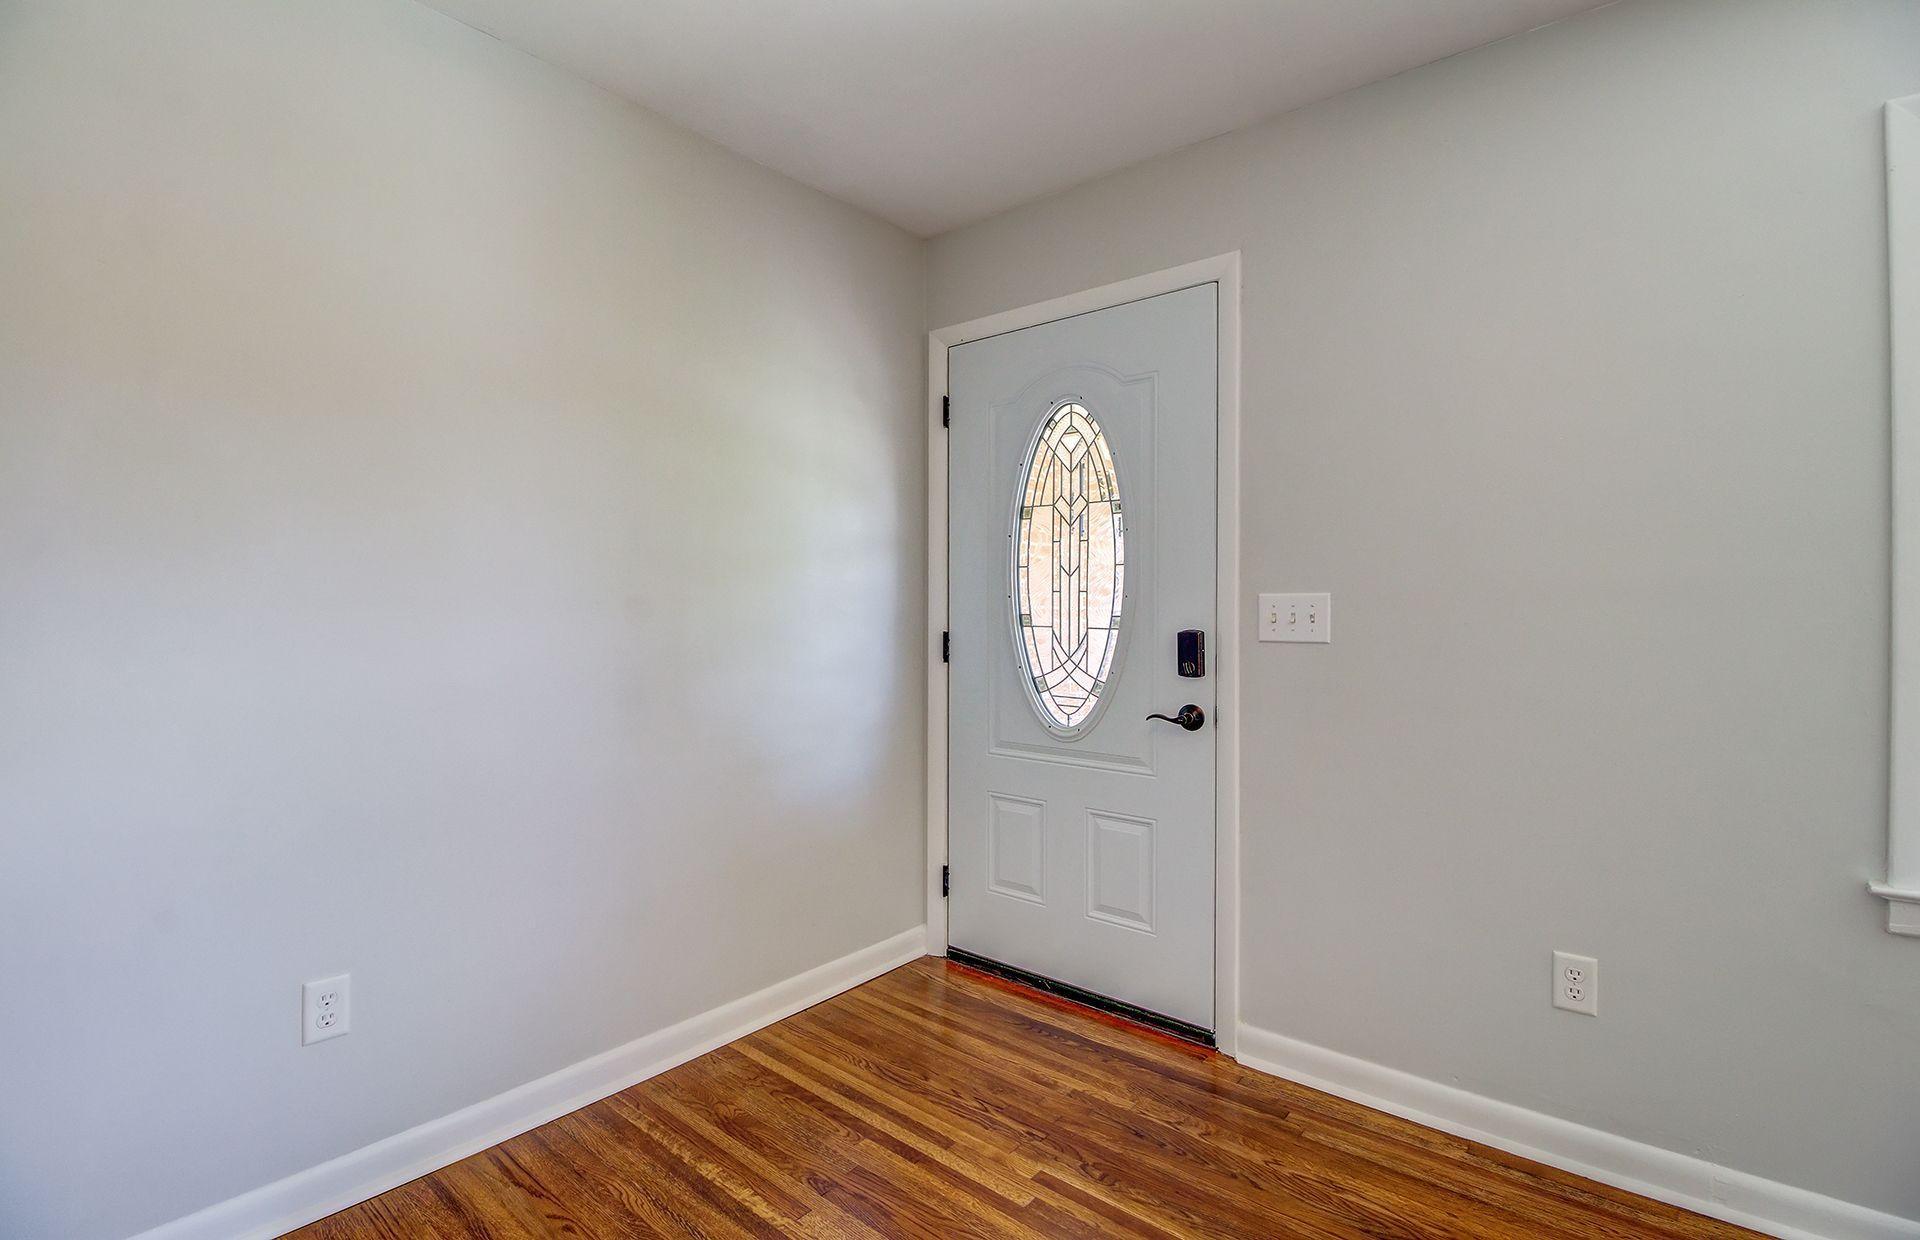 Belvedere Estates Homes For Sale - 6010 Ridgecrest, Hanahan, SC - 11